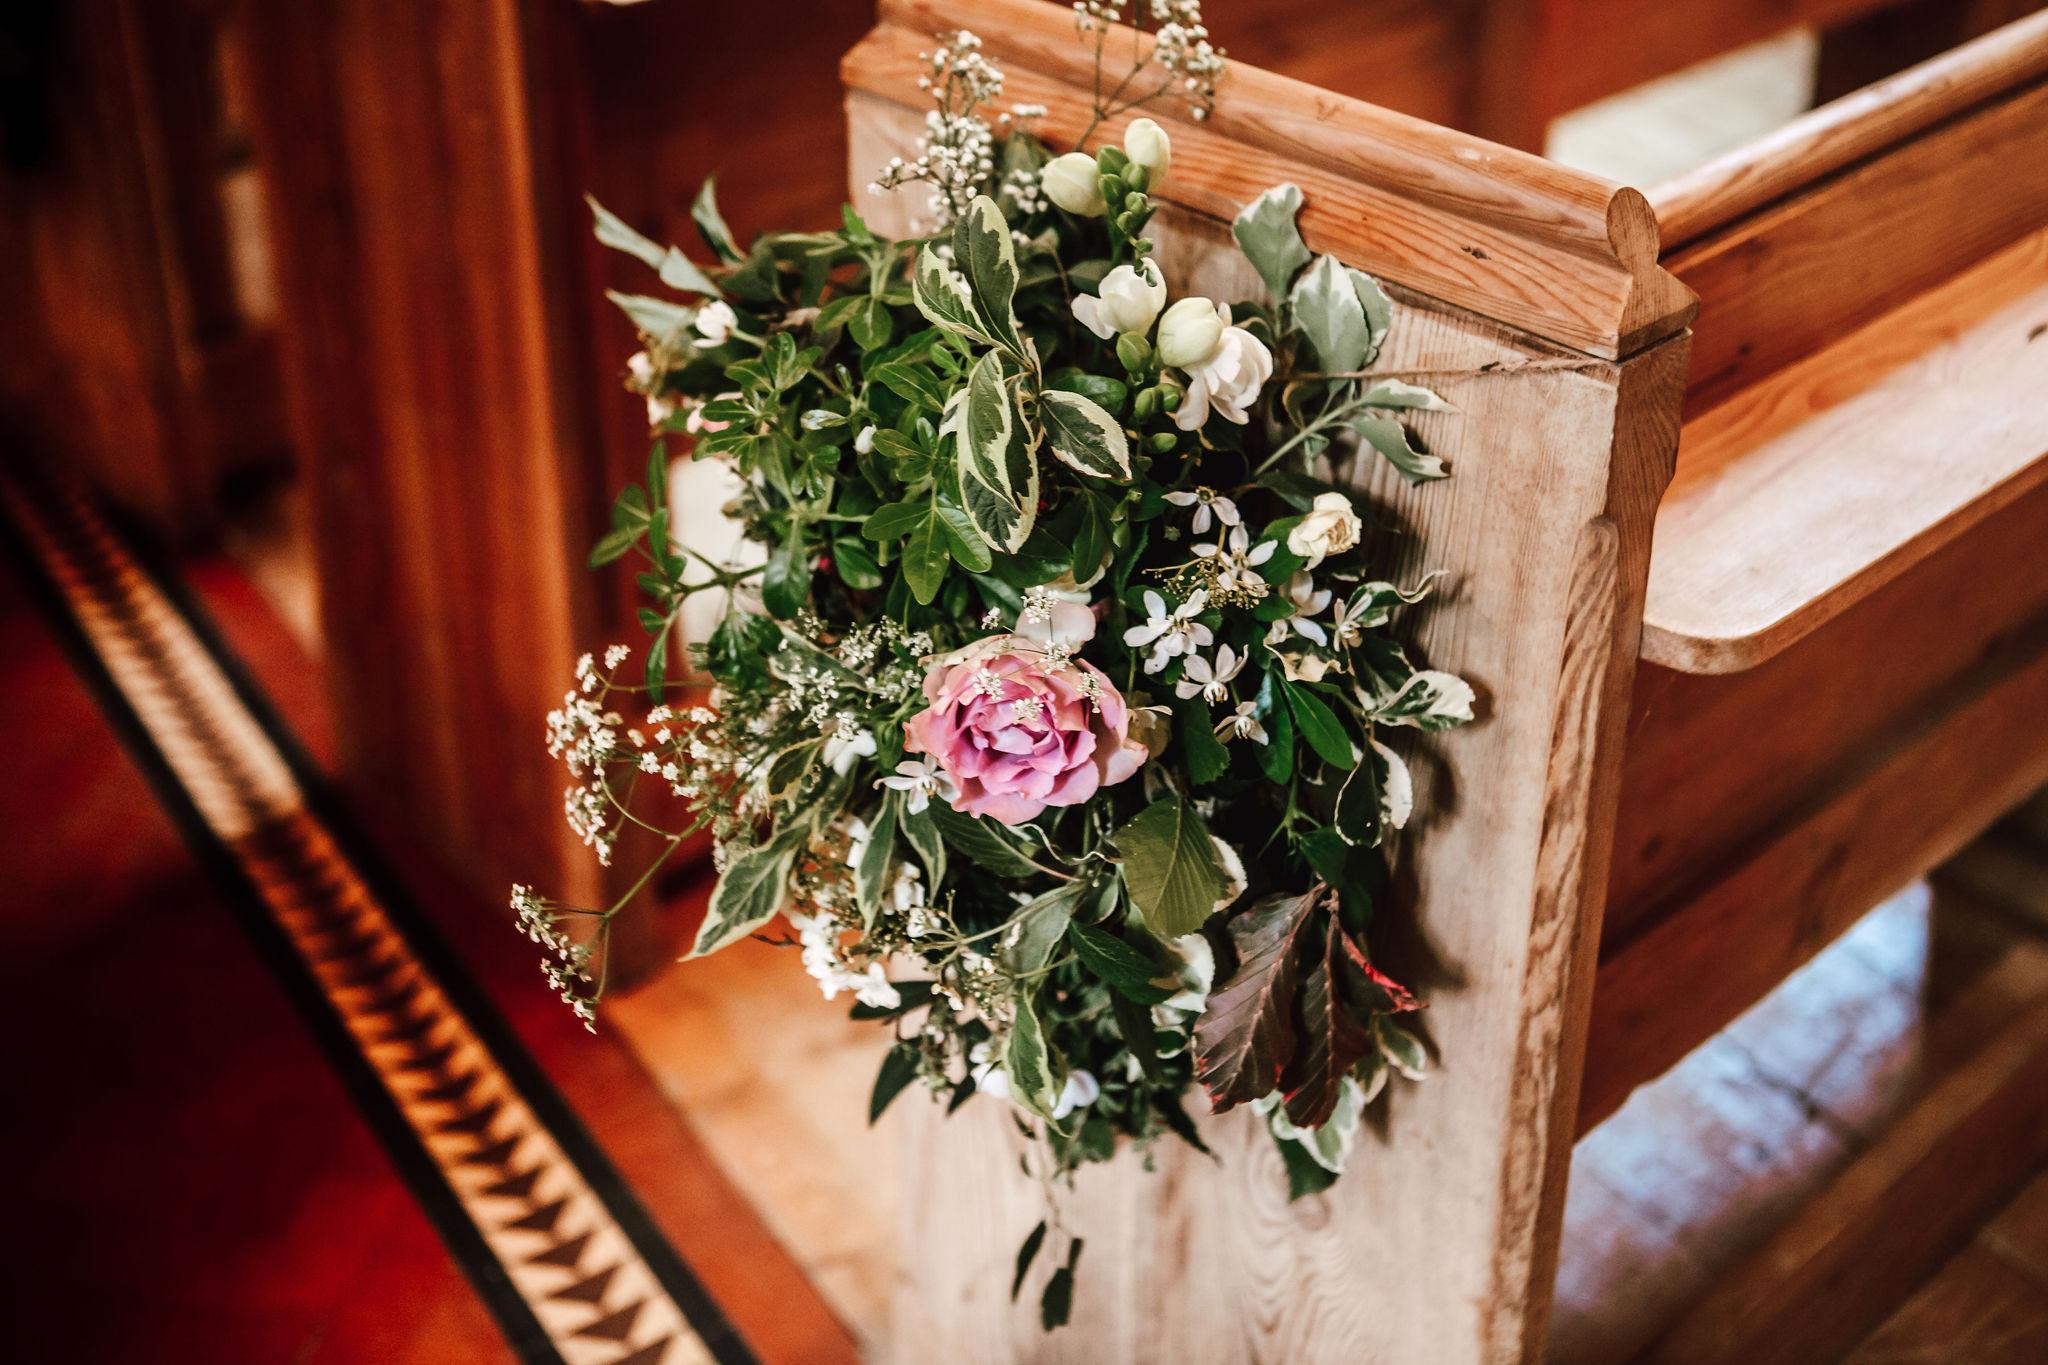 fiesta-fields-louisa-thomas-blog-church-flowers-abigailwhite.jpg